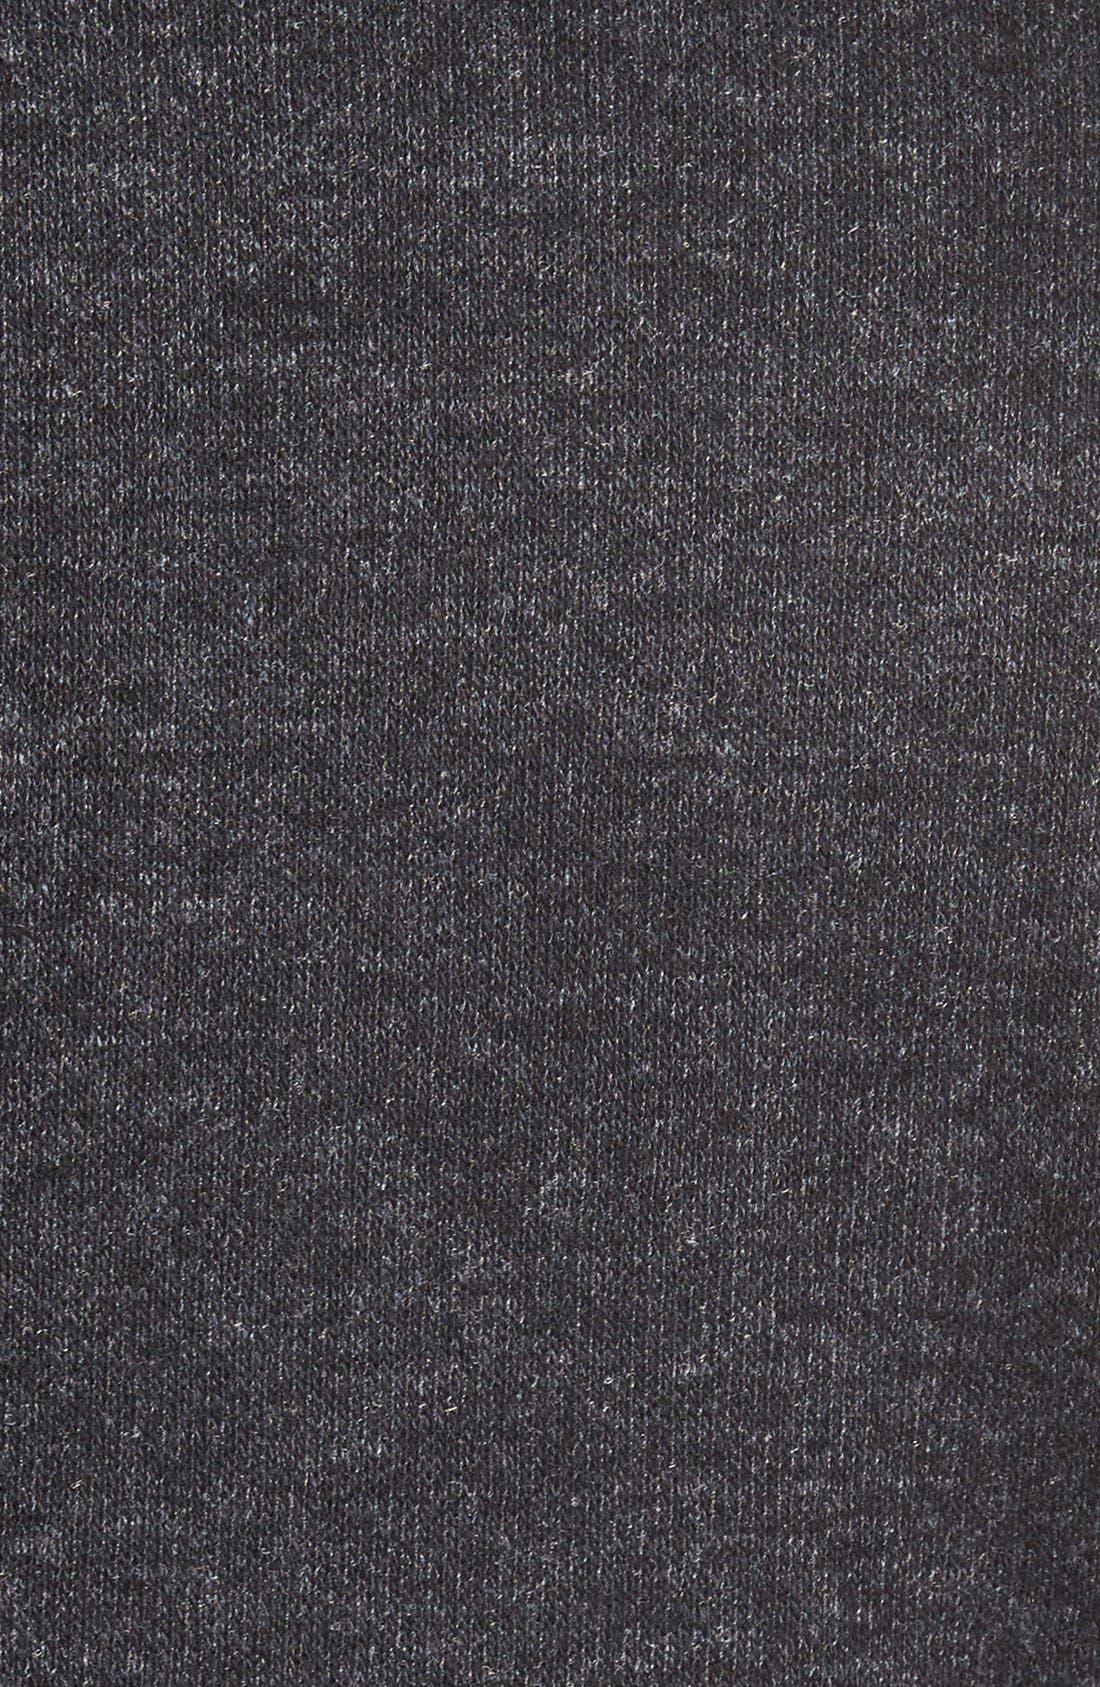 BOSS 'Shawn' Wool Blend Overcoat,                             Alternate thumbnail 5, color,                             402